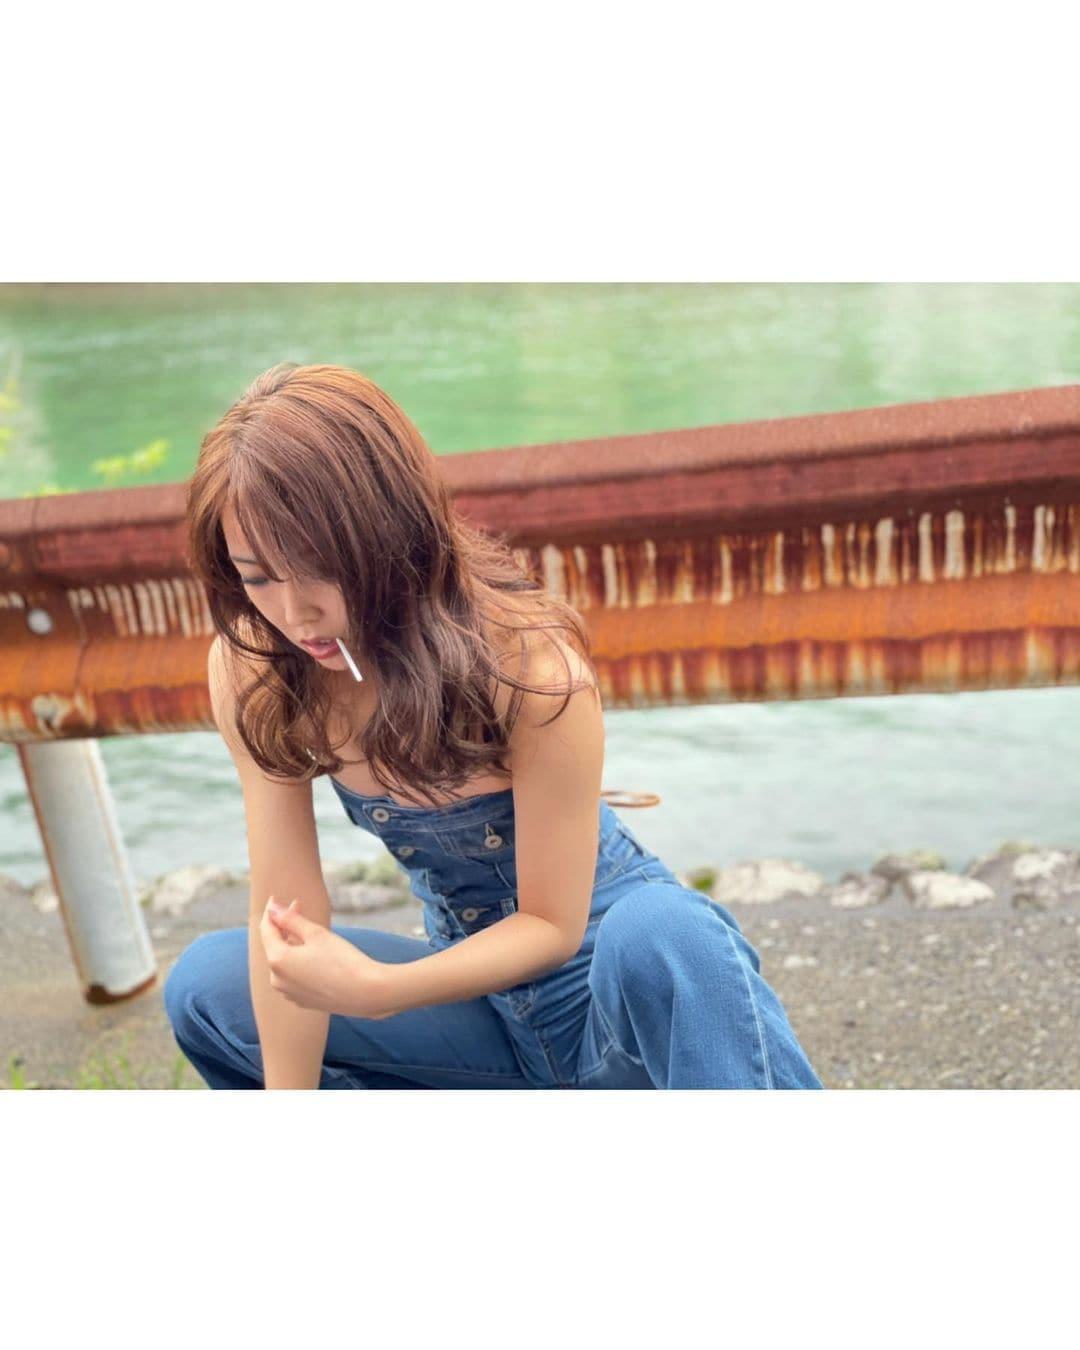 NMB48白間美瑠「色っぽくてかっこいい!」写真集『REBORN』オフショット公開にファン歓喜【画像8枚】の画像002